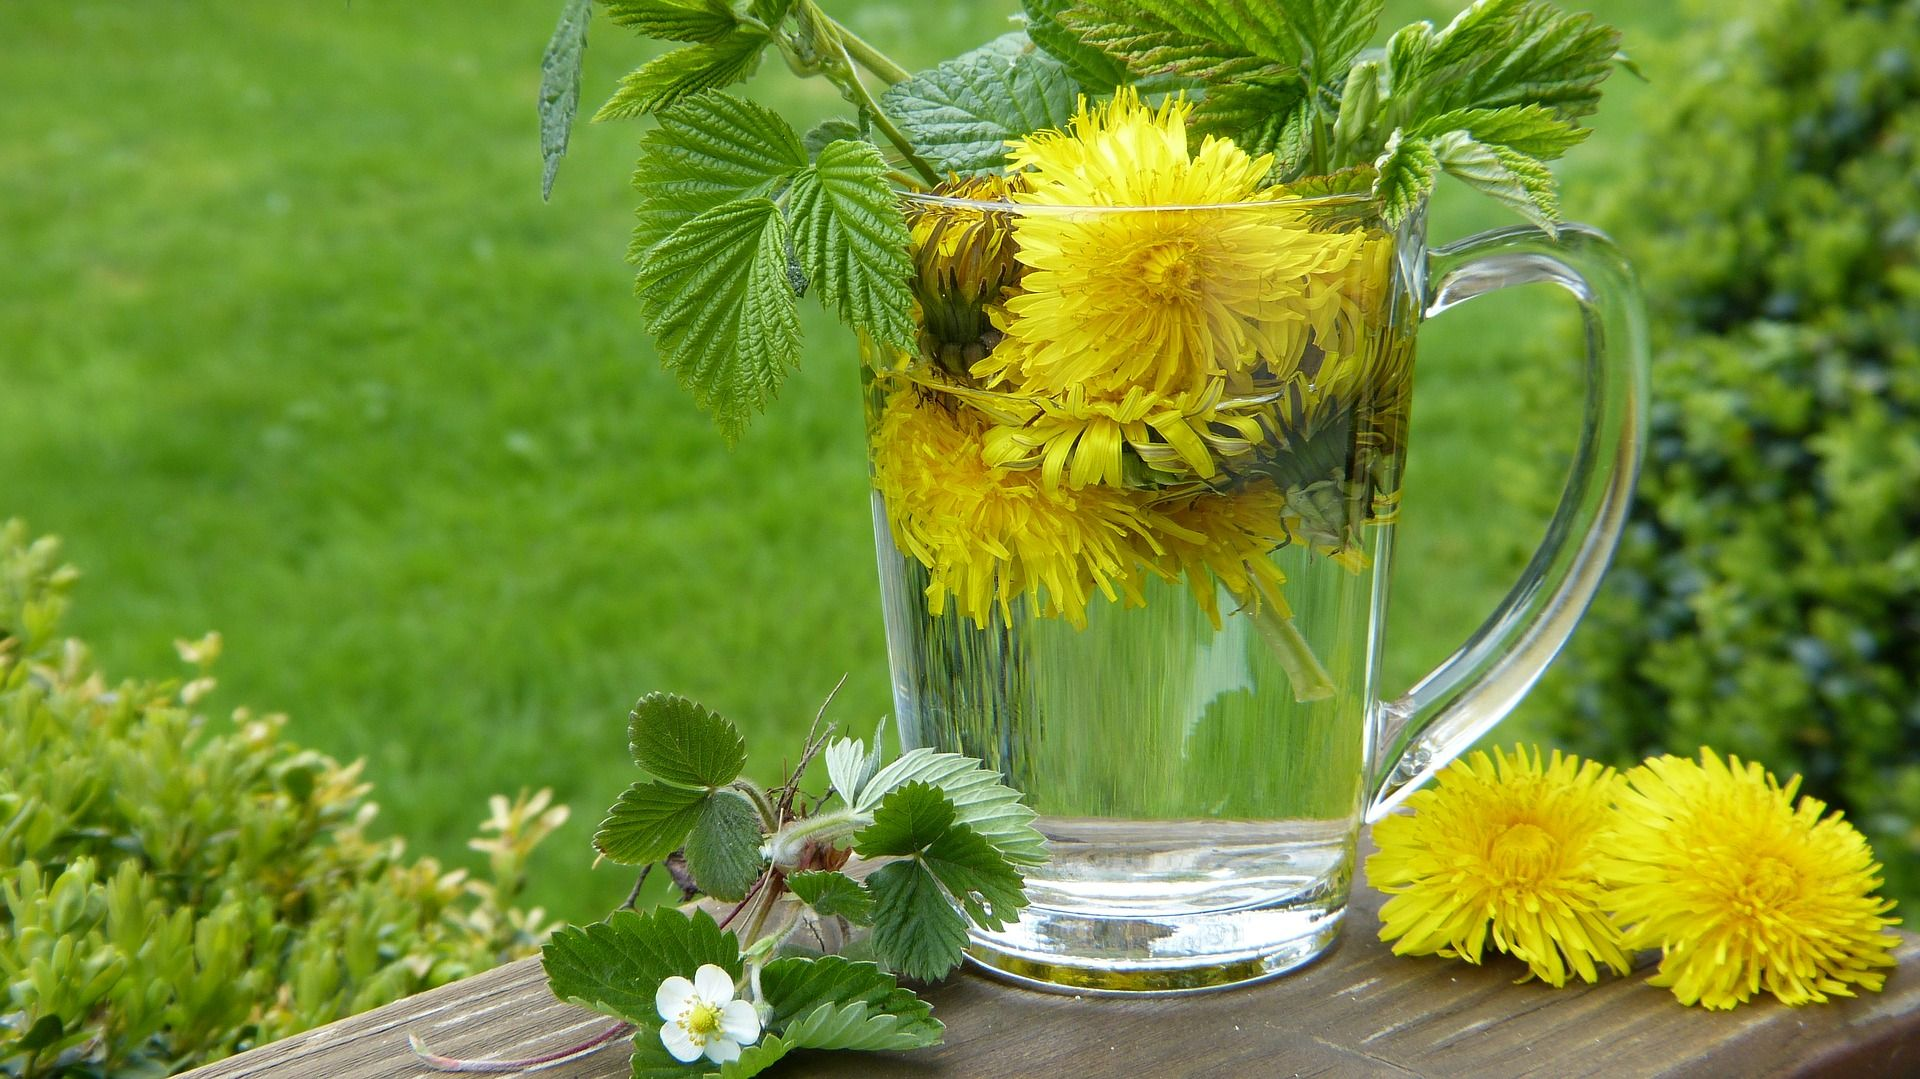 Dandelion Liqueur Recipe D I Y Dandelion Tea Dandelion Wine Dandelion Benefits